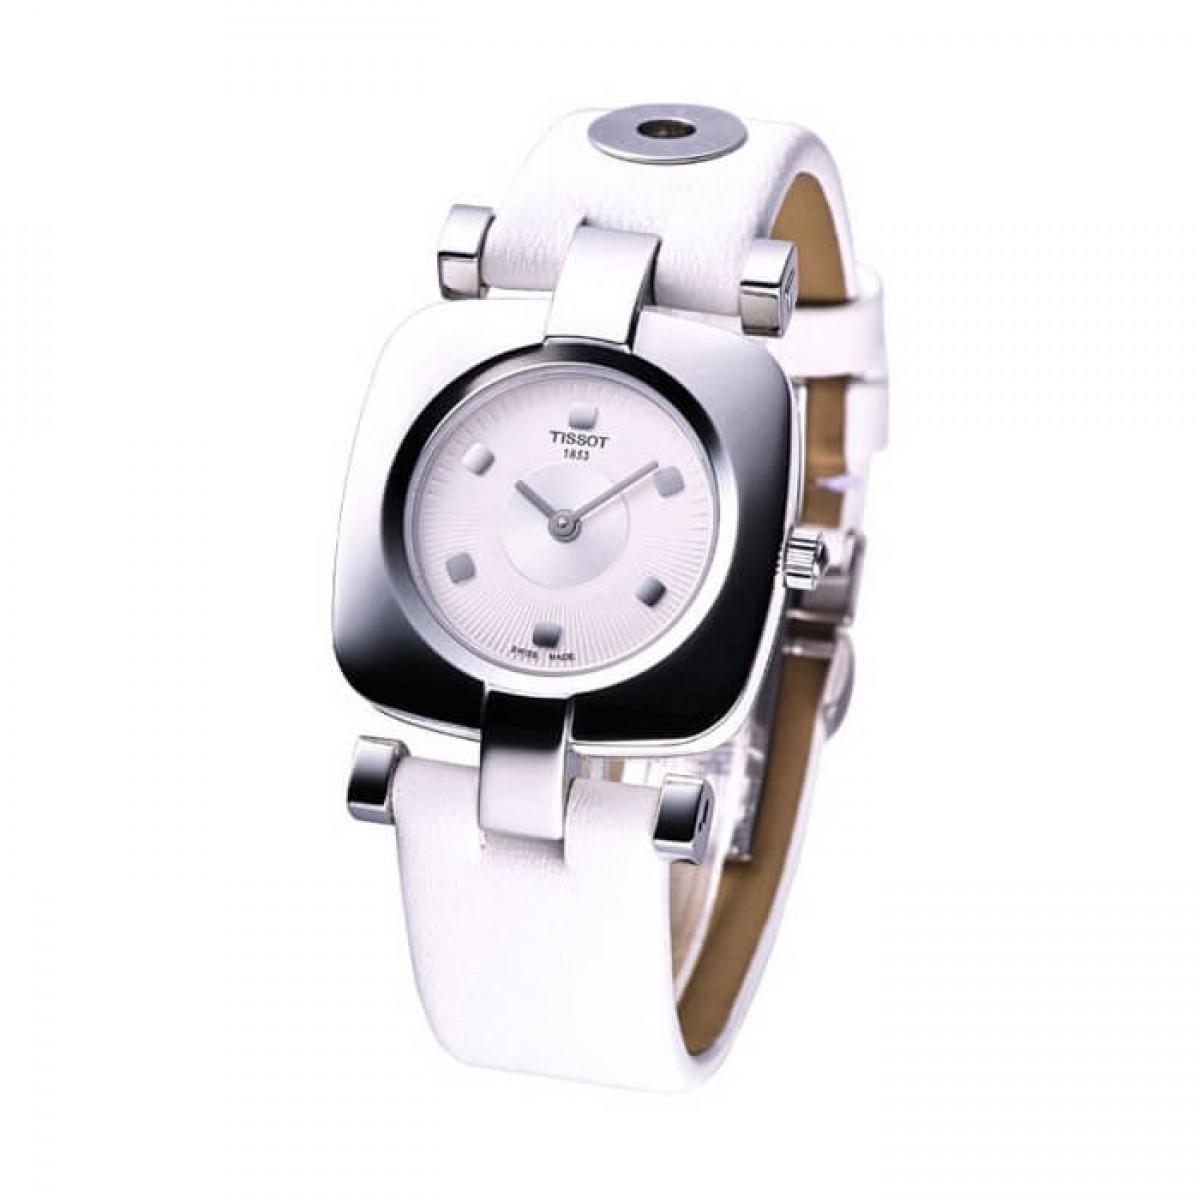 Часовник Tissot T020.309.16.031.01